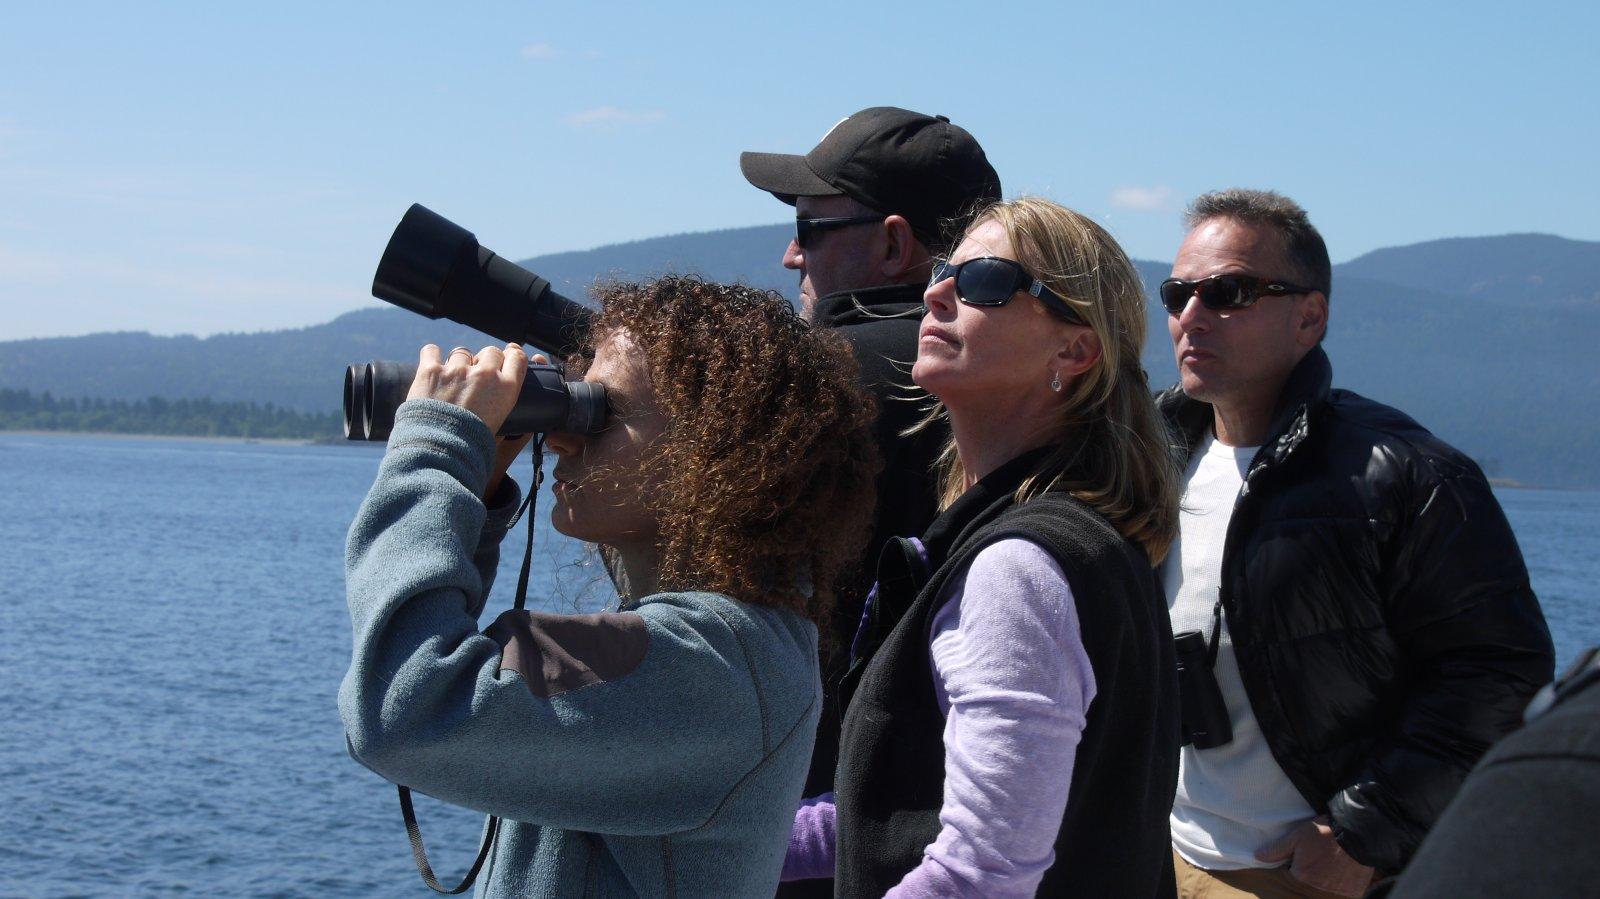 Blackfish_Dogwoof_Documentary_(5)_1600_899_85.JPG